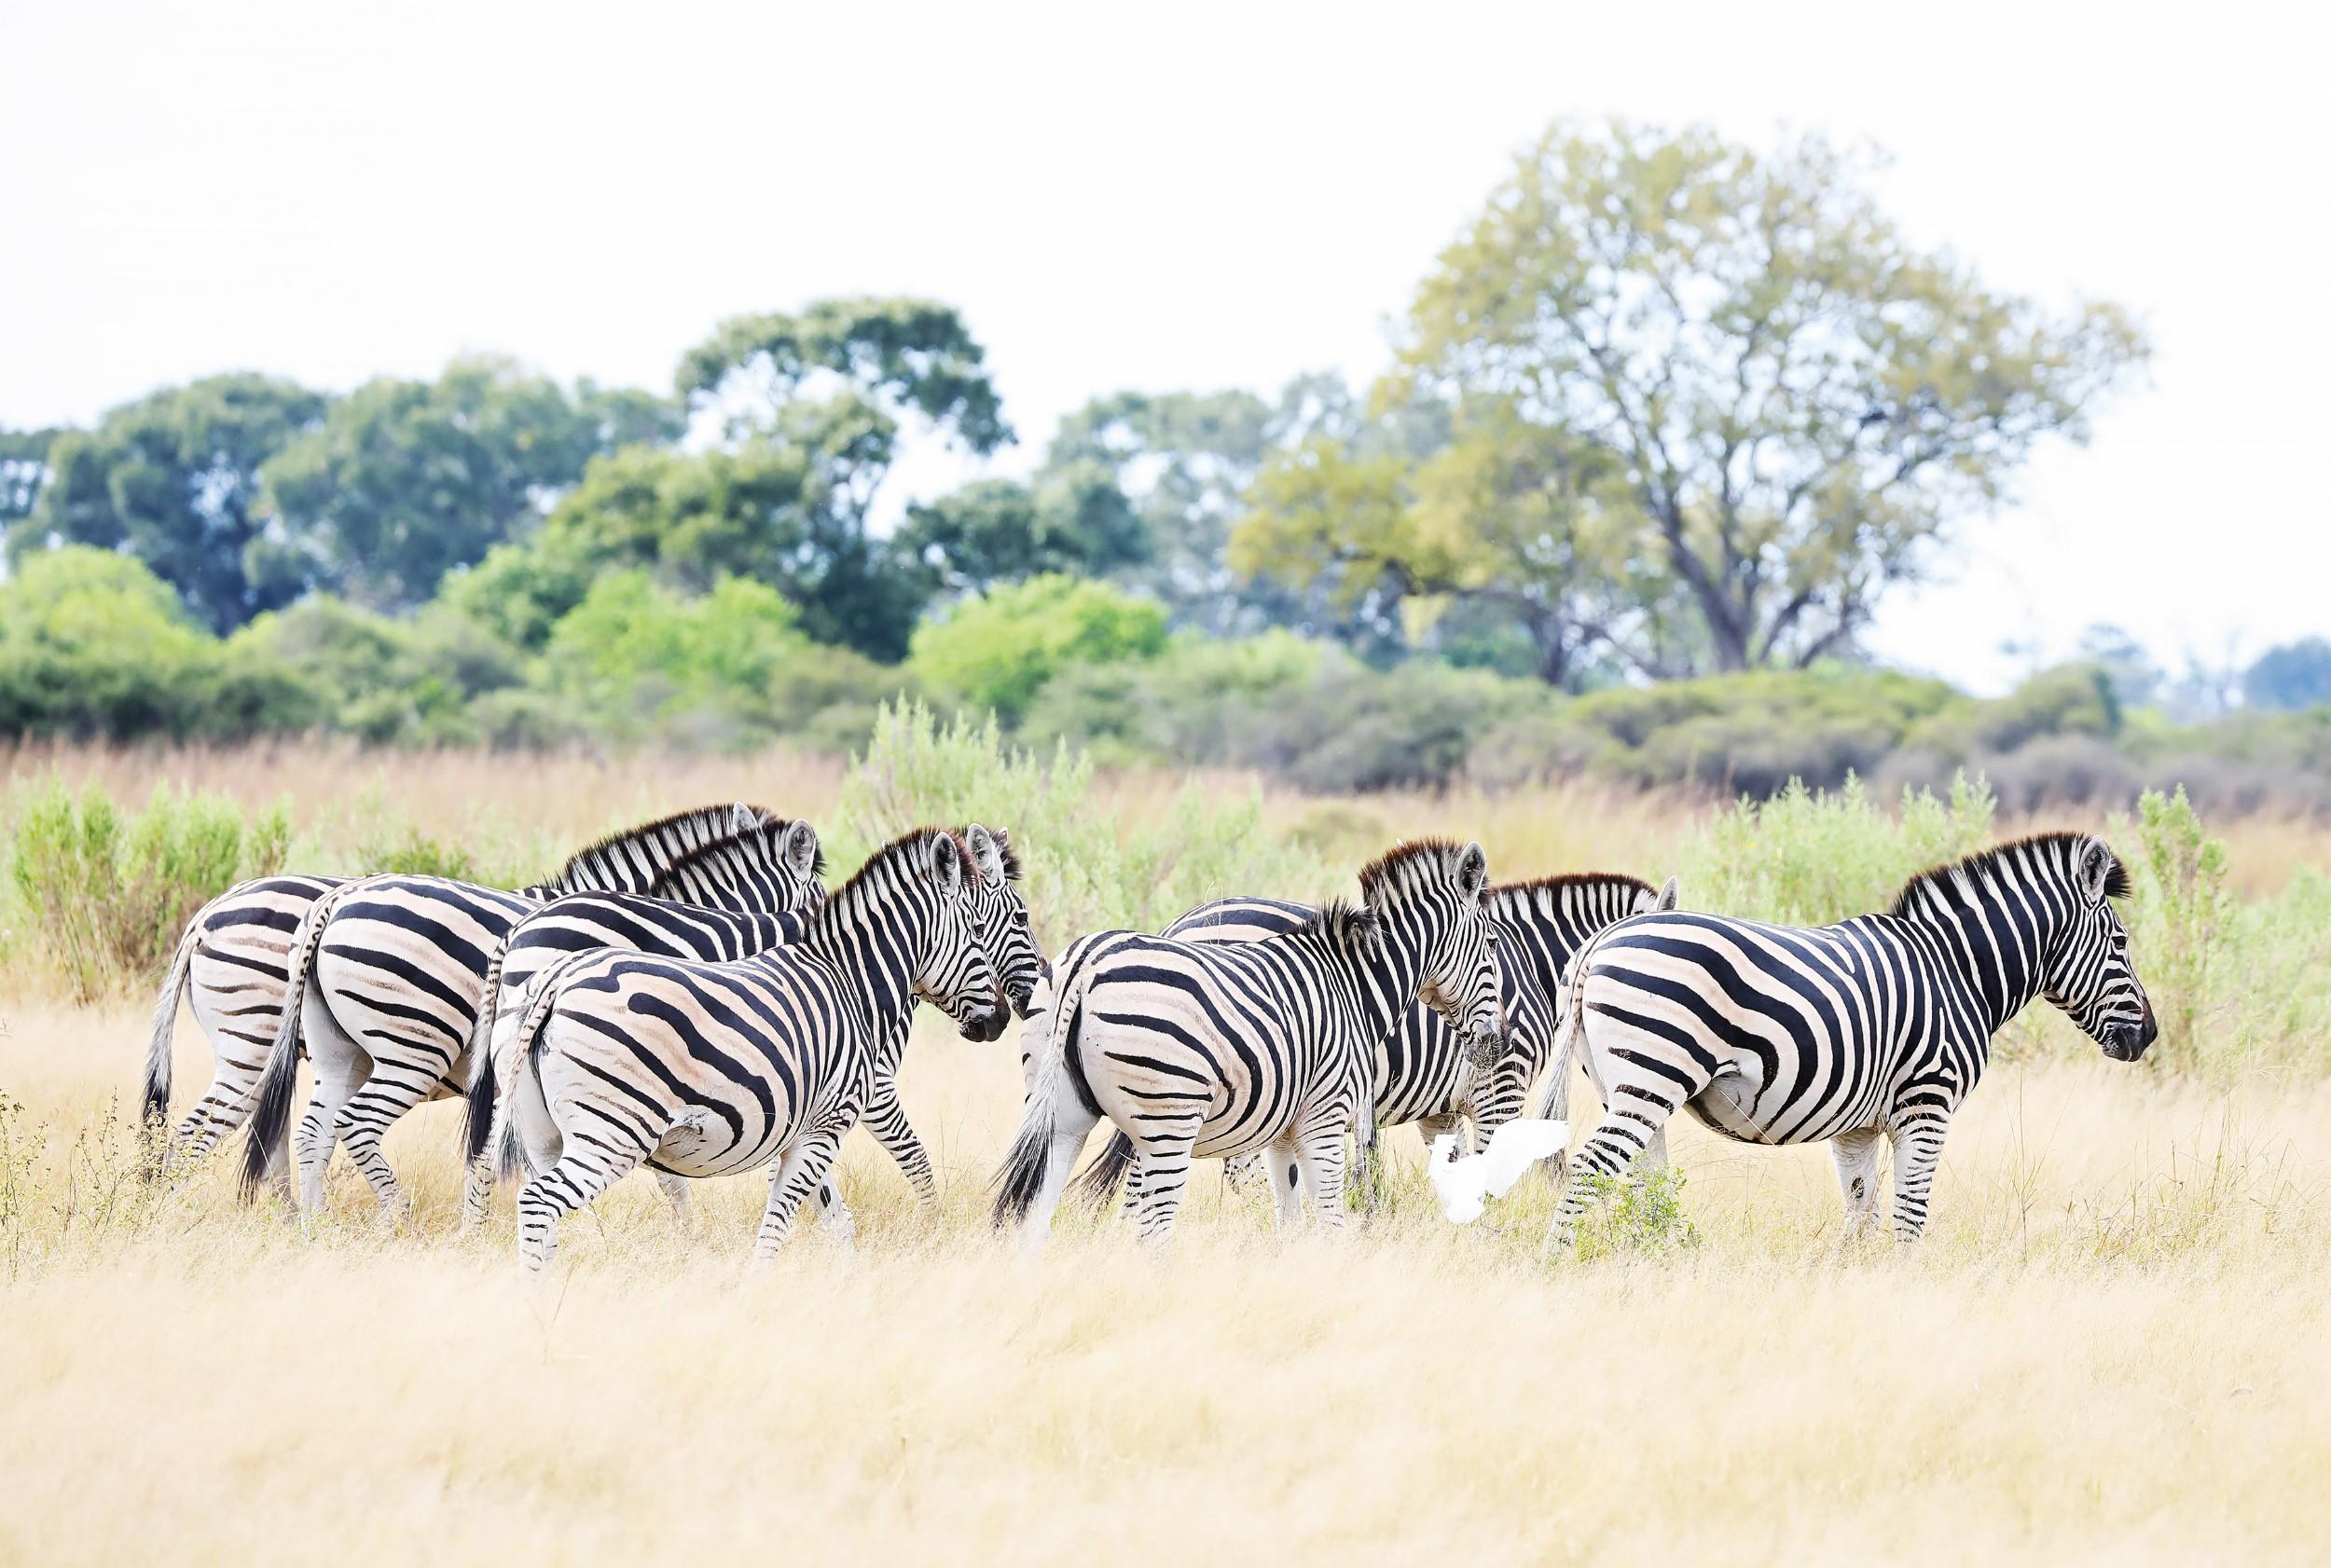 25The Jackal and Hide - Zebra.jpg